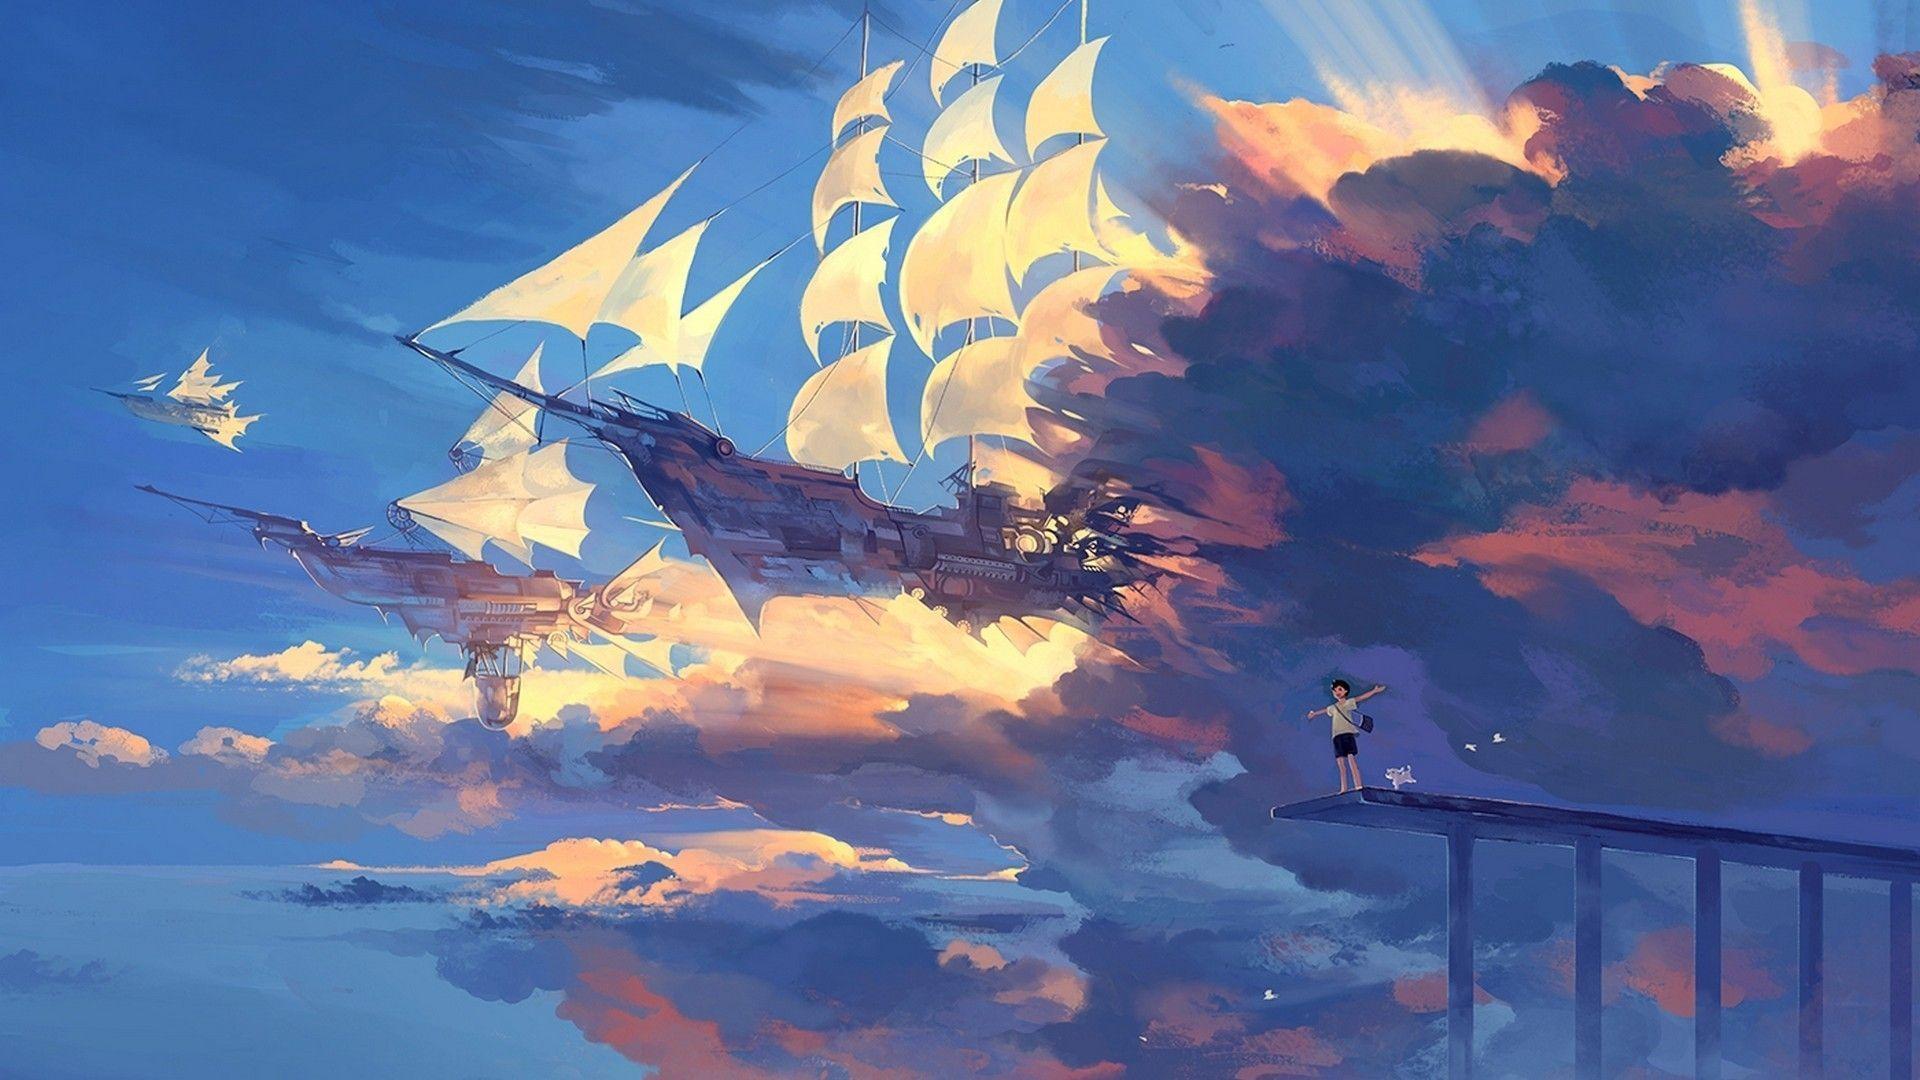 hd anime scenery wallpaper